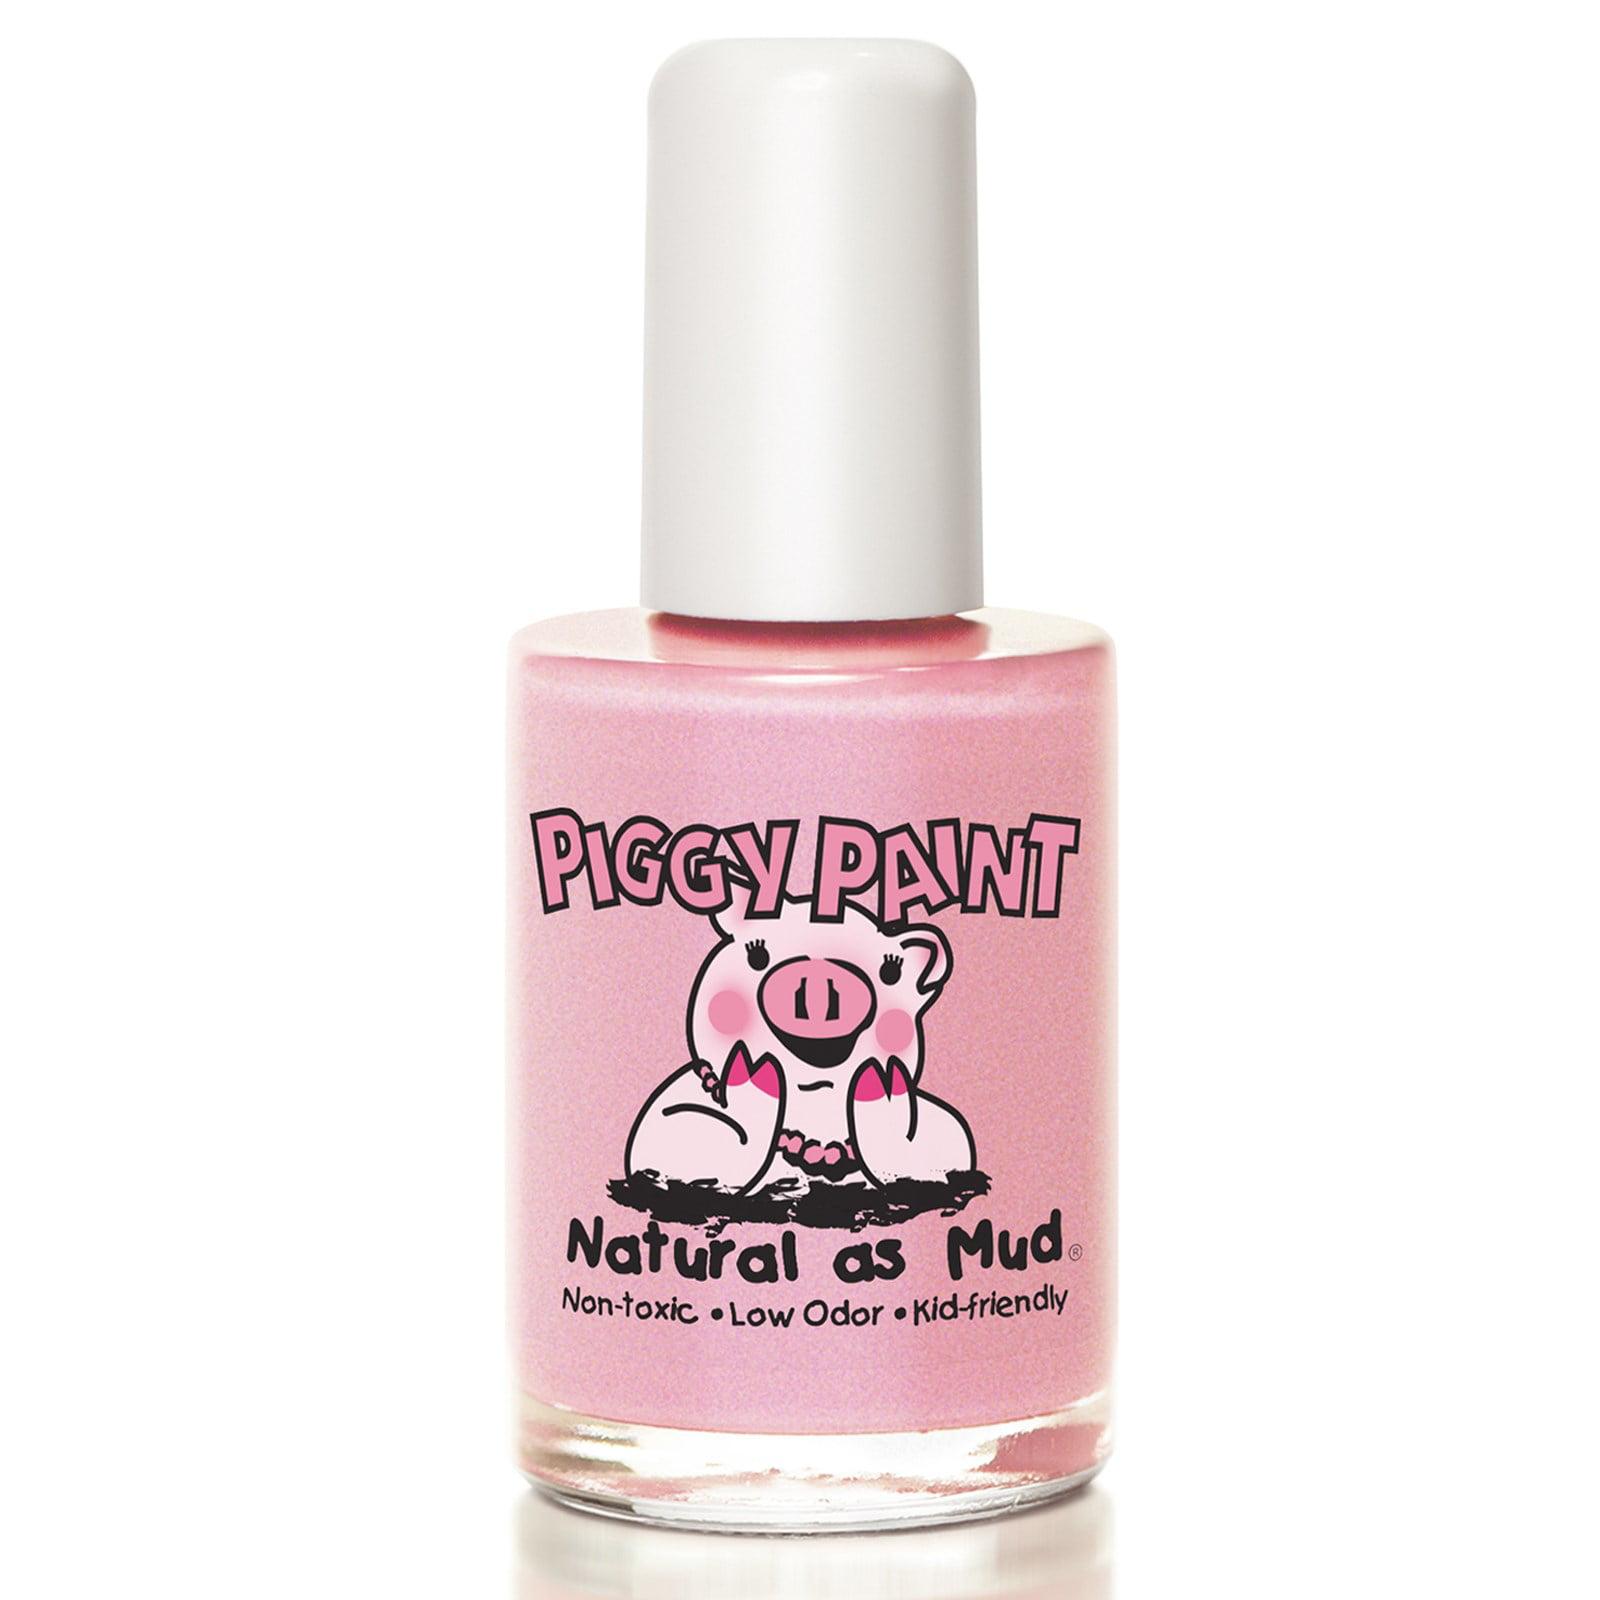 Piggy Paint, Nail Polish, Sweetpea, 0.5 fl oz (pack of 1)